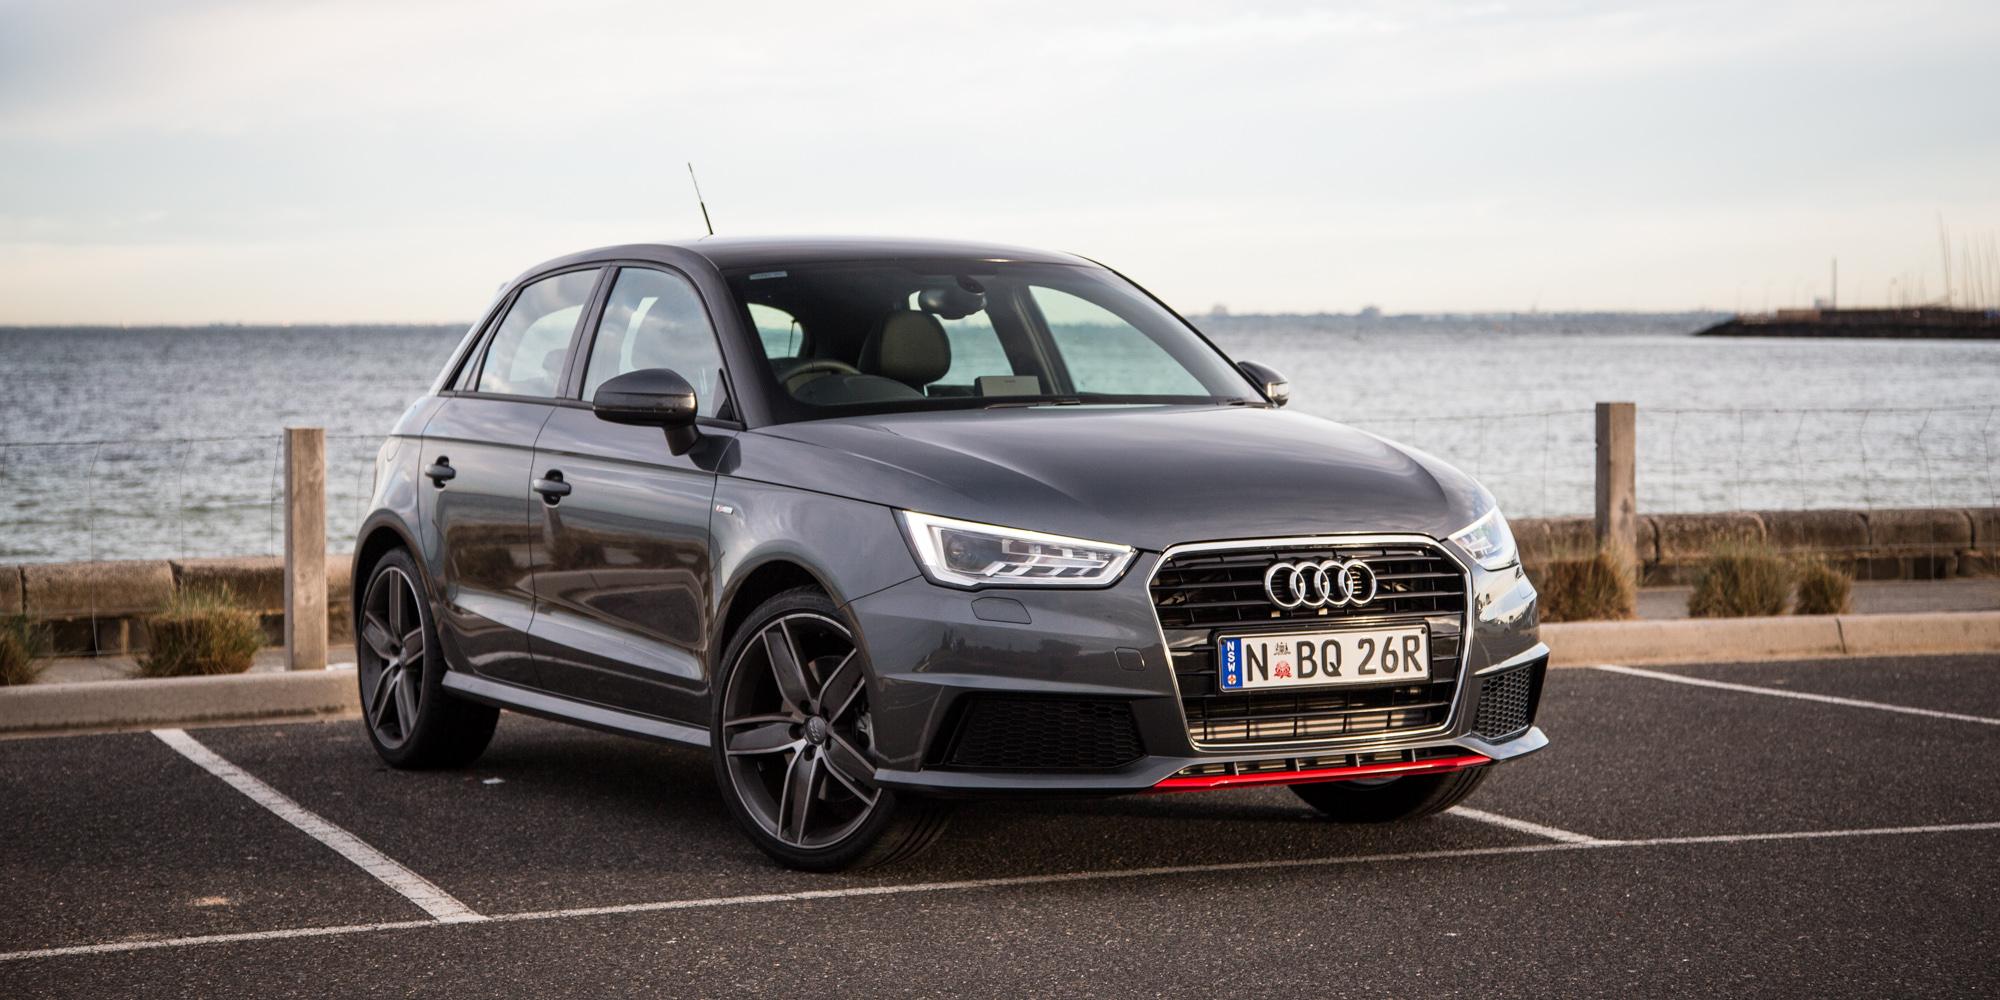 2015 Audi A1 Sportback Review 1 8 Tfsi S Line Caradvice